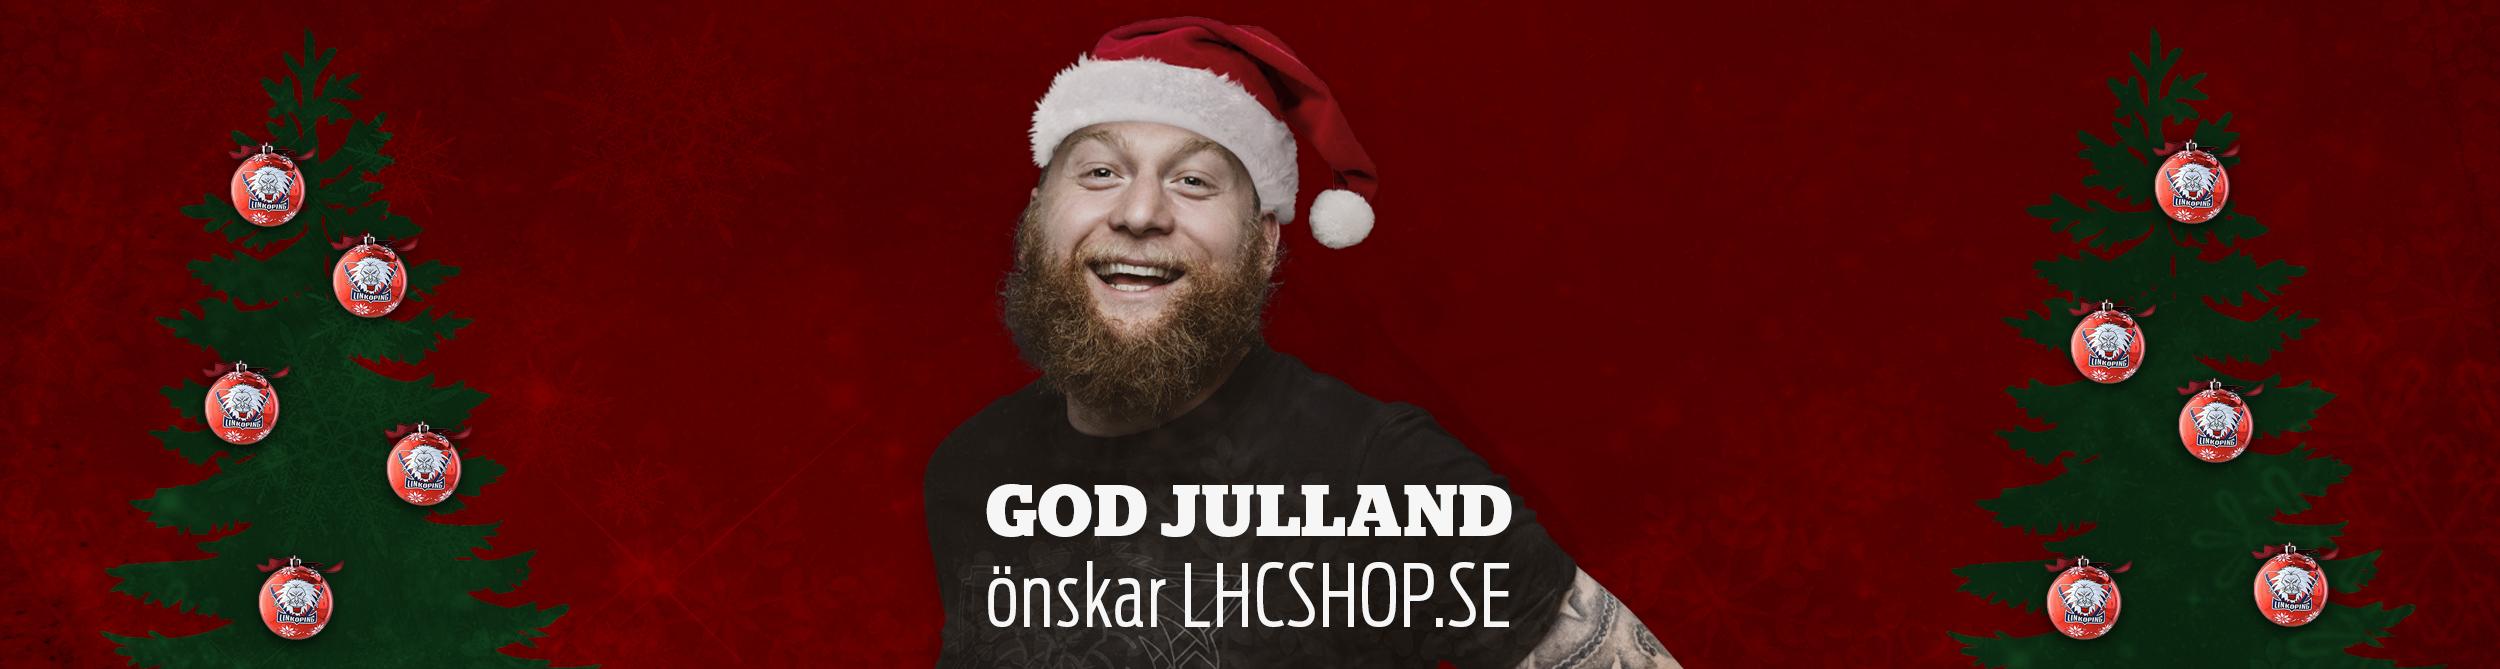 https://lhcshop.se/image/3019/Julland_banner_2.jpg